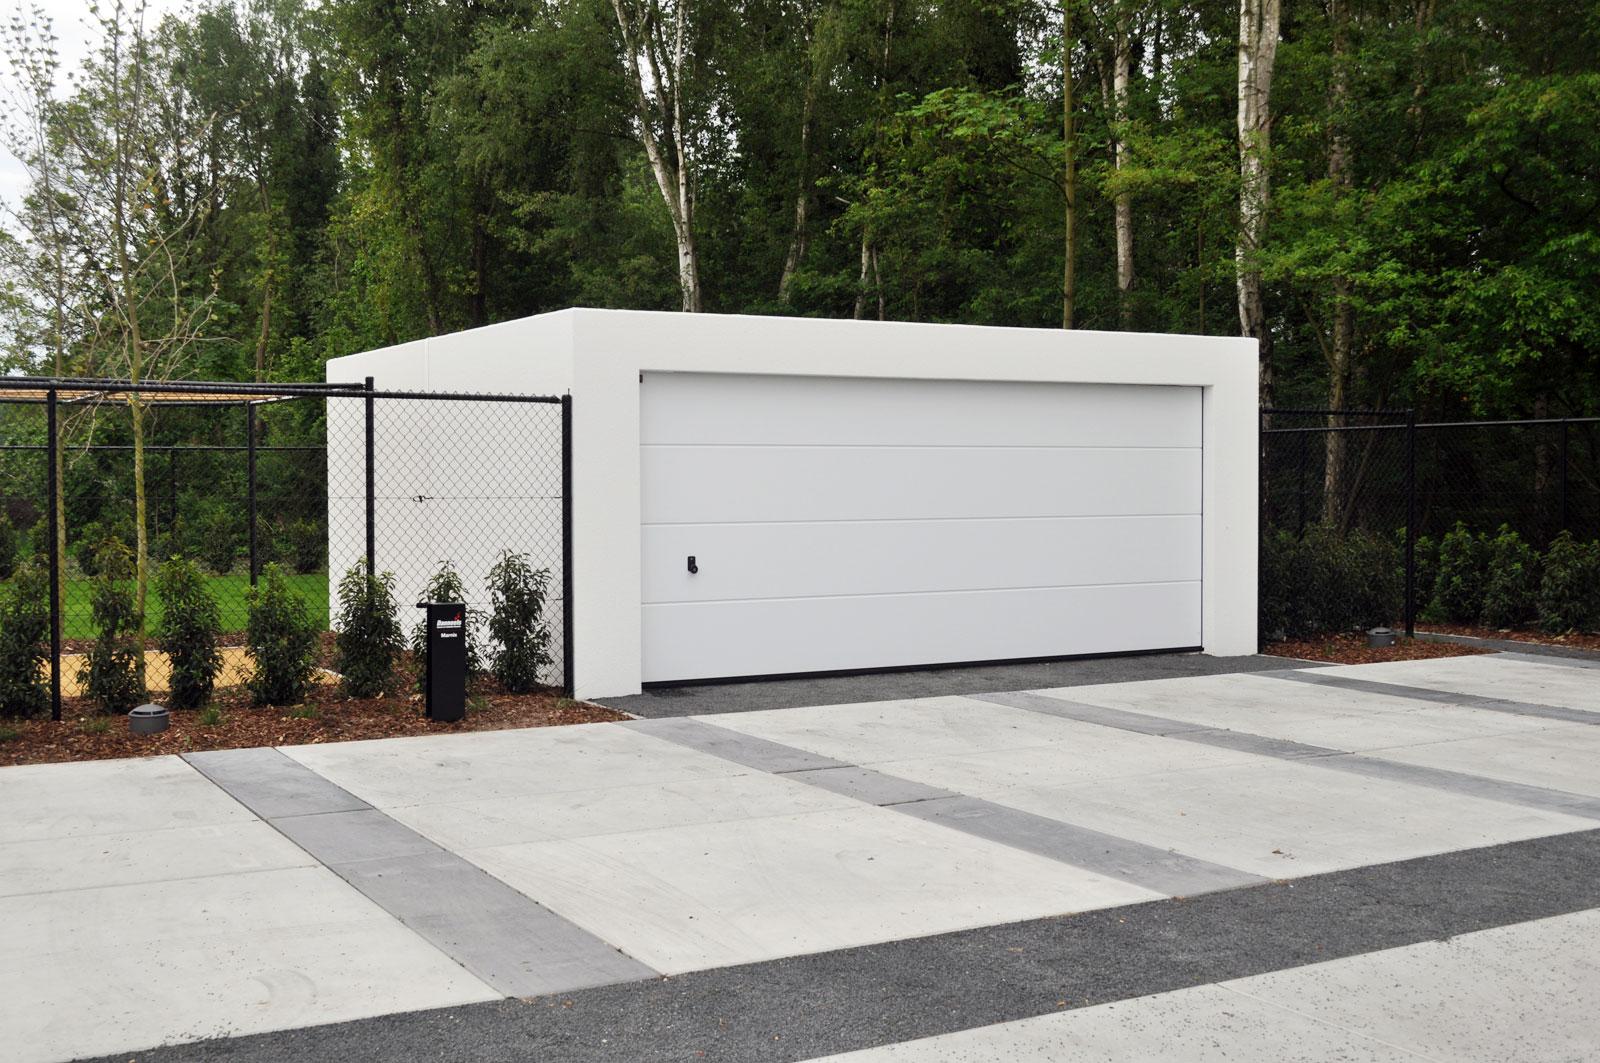 Prefab Garage Steen : Een prefab garagebox snel en budgetvriendelijk z i n d e r i n g